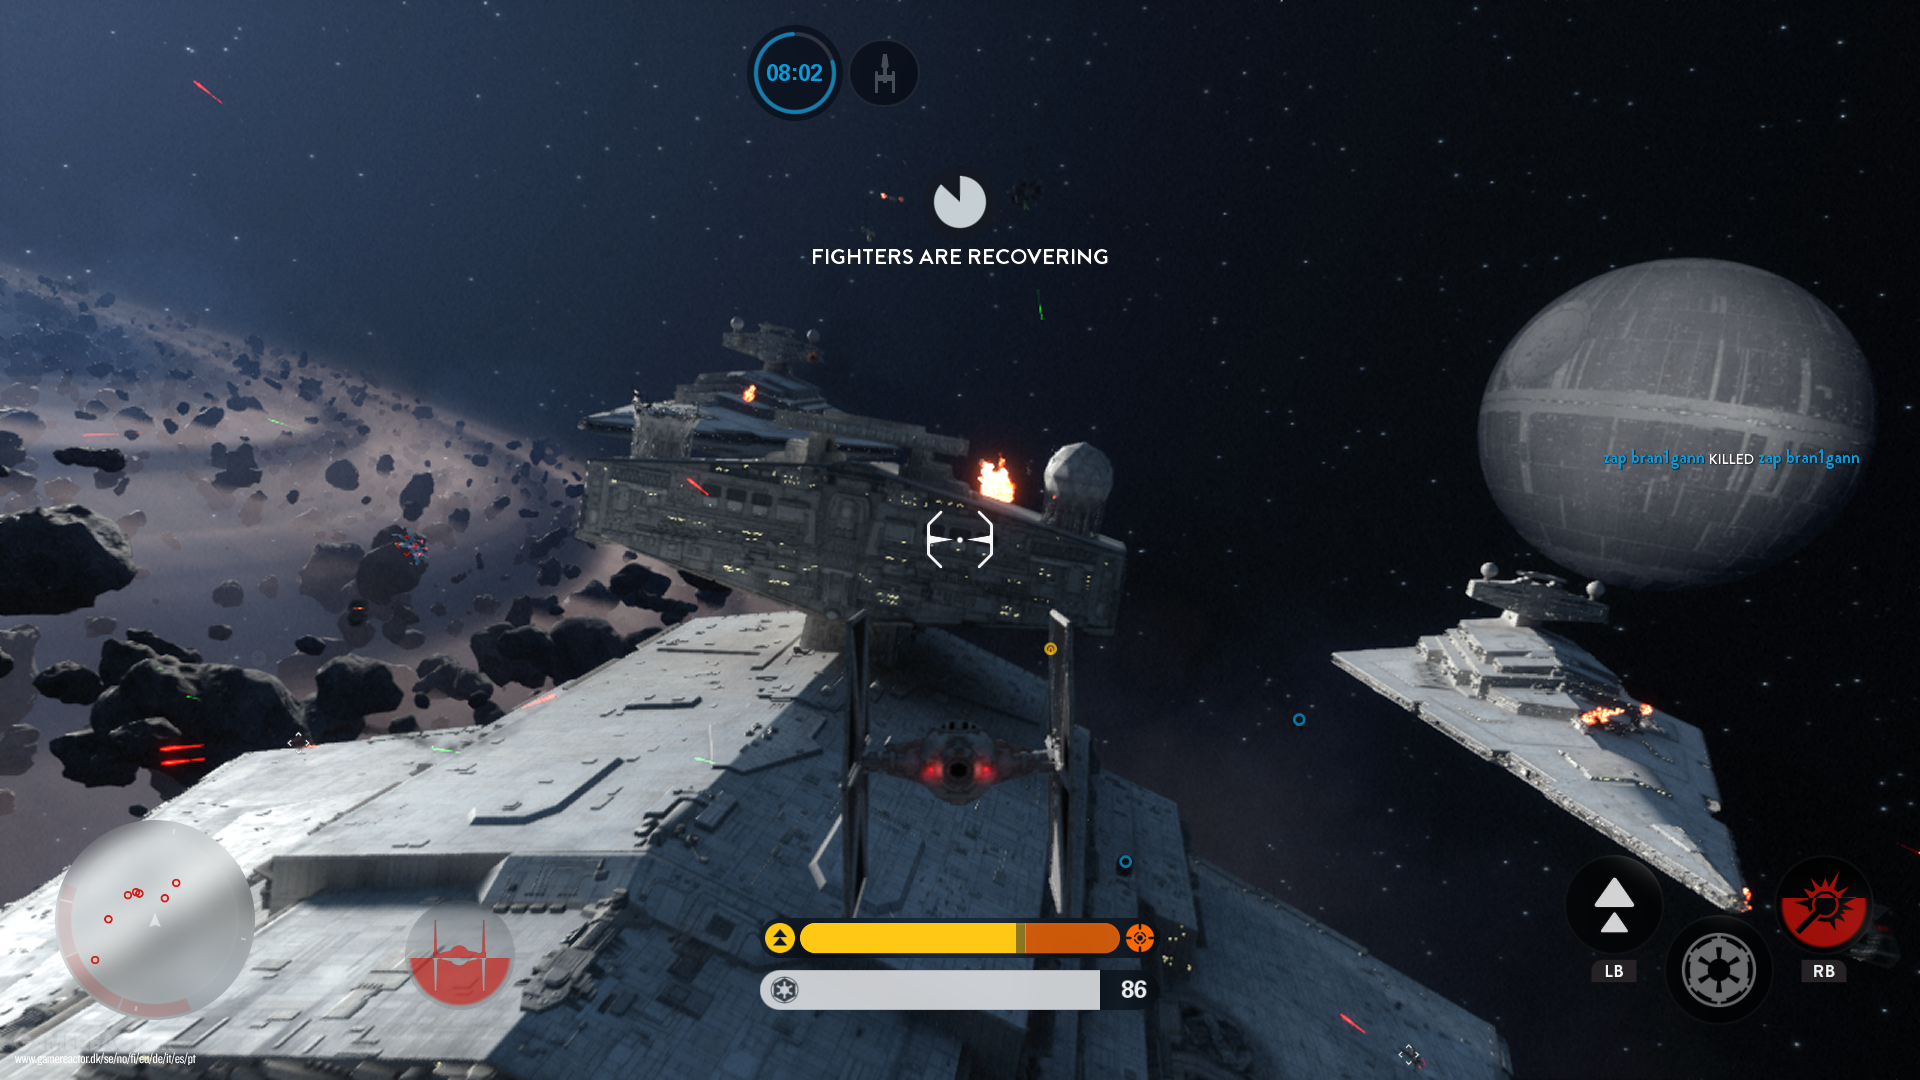 Pictures Of Star Wars Battlefront Death Star Gameplay 6 9